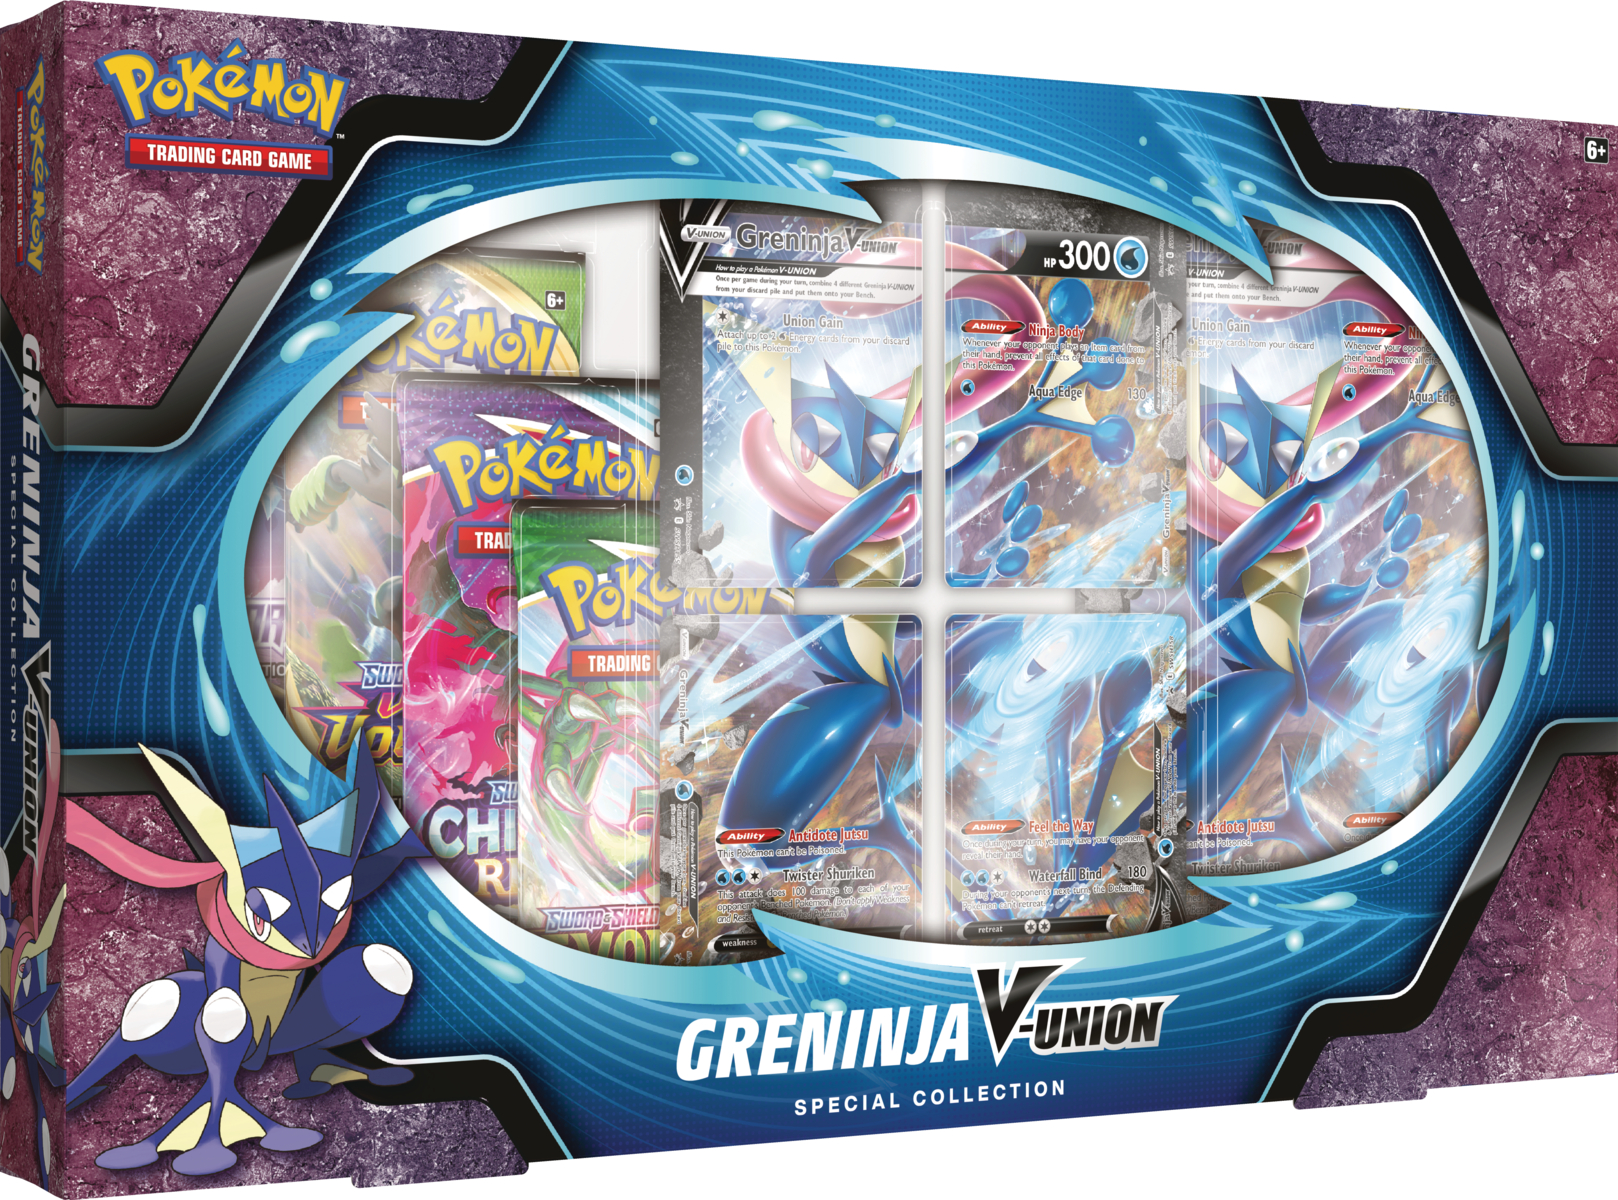 Pokemon: V Union Premium Collection - Greninja